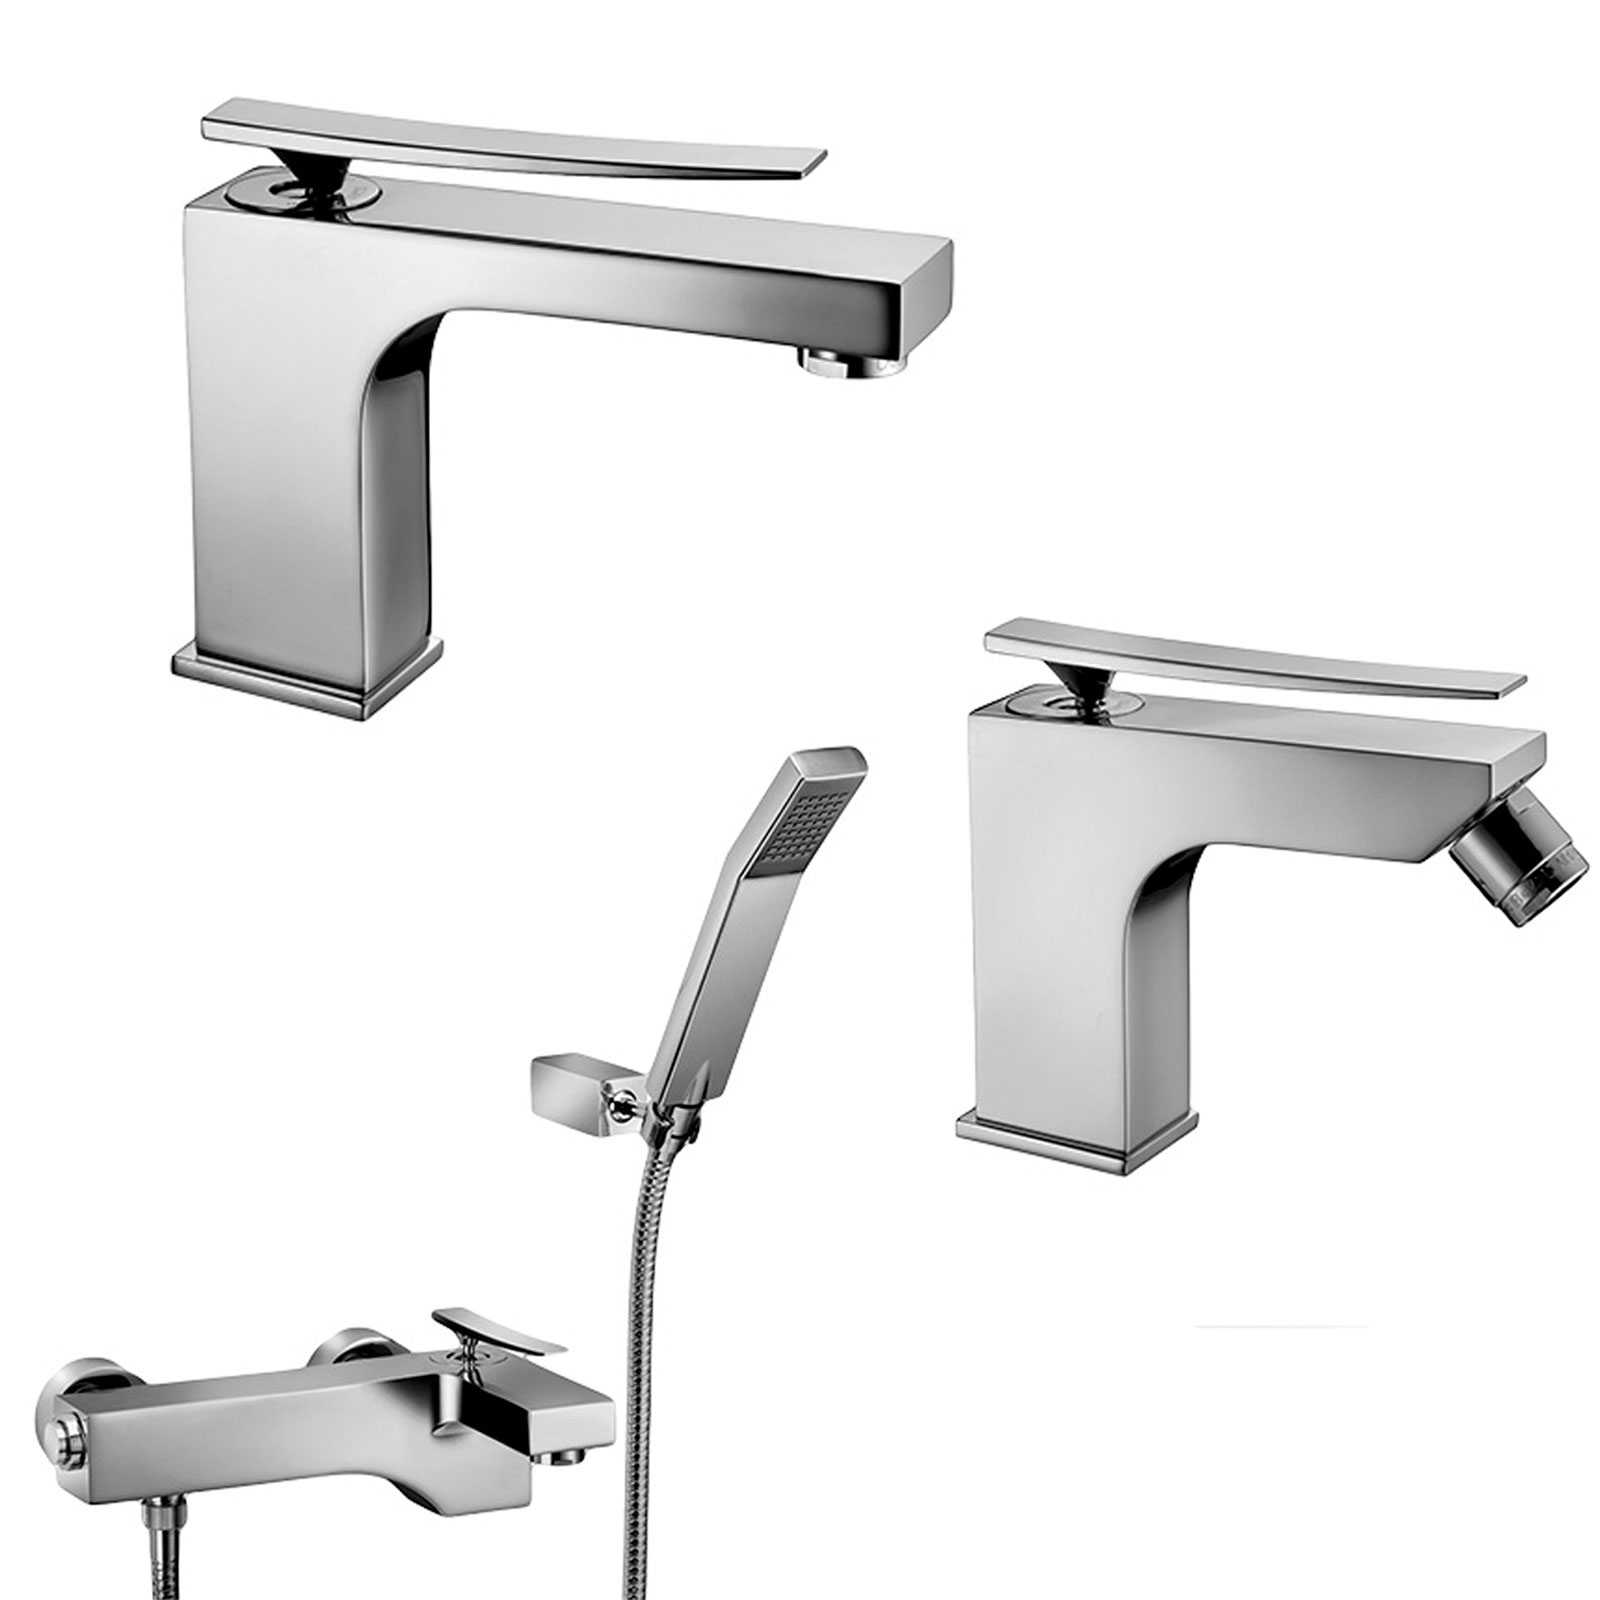 Set di miscelatori lavabo, bidet e doccia con deviatore paffoni Elys ELY075CR + ELY135CR + ELY023CR